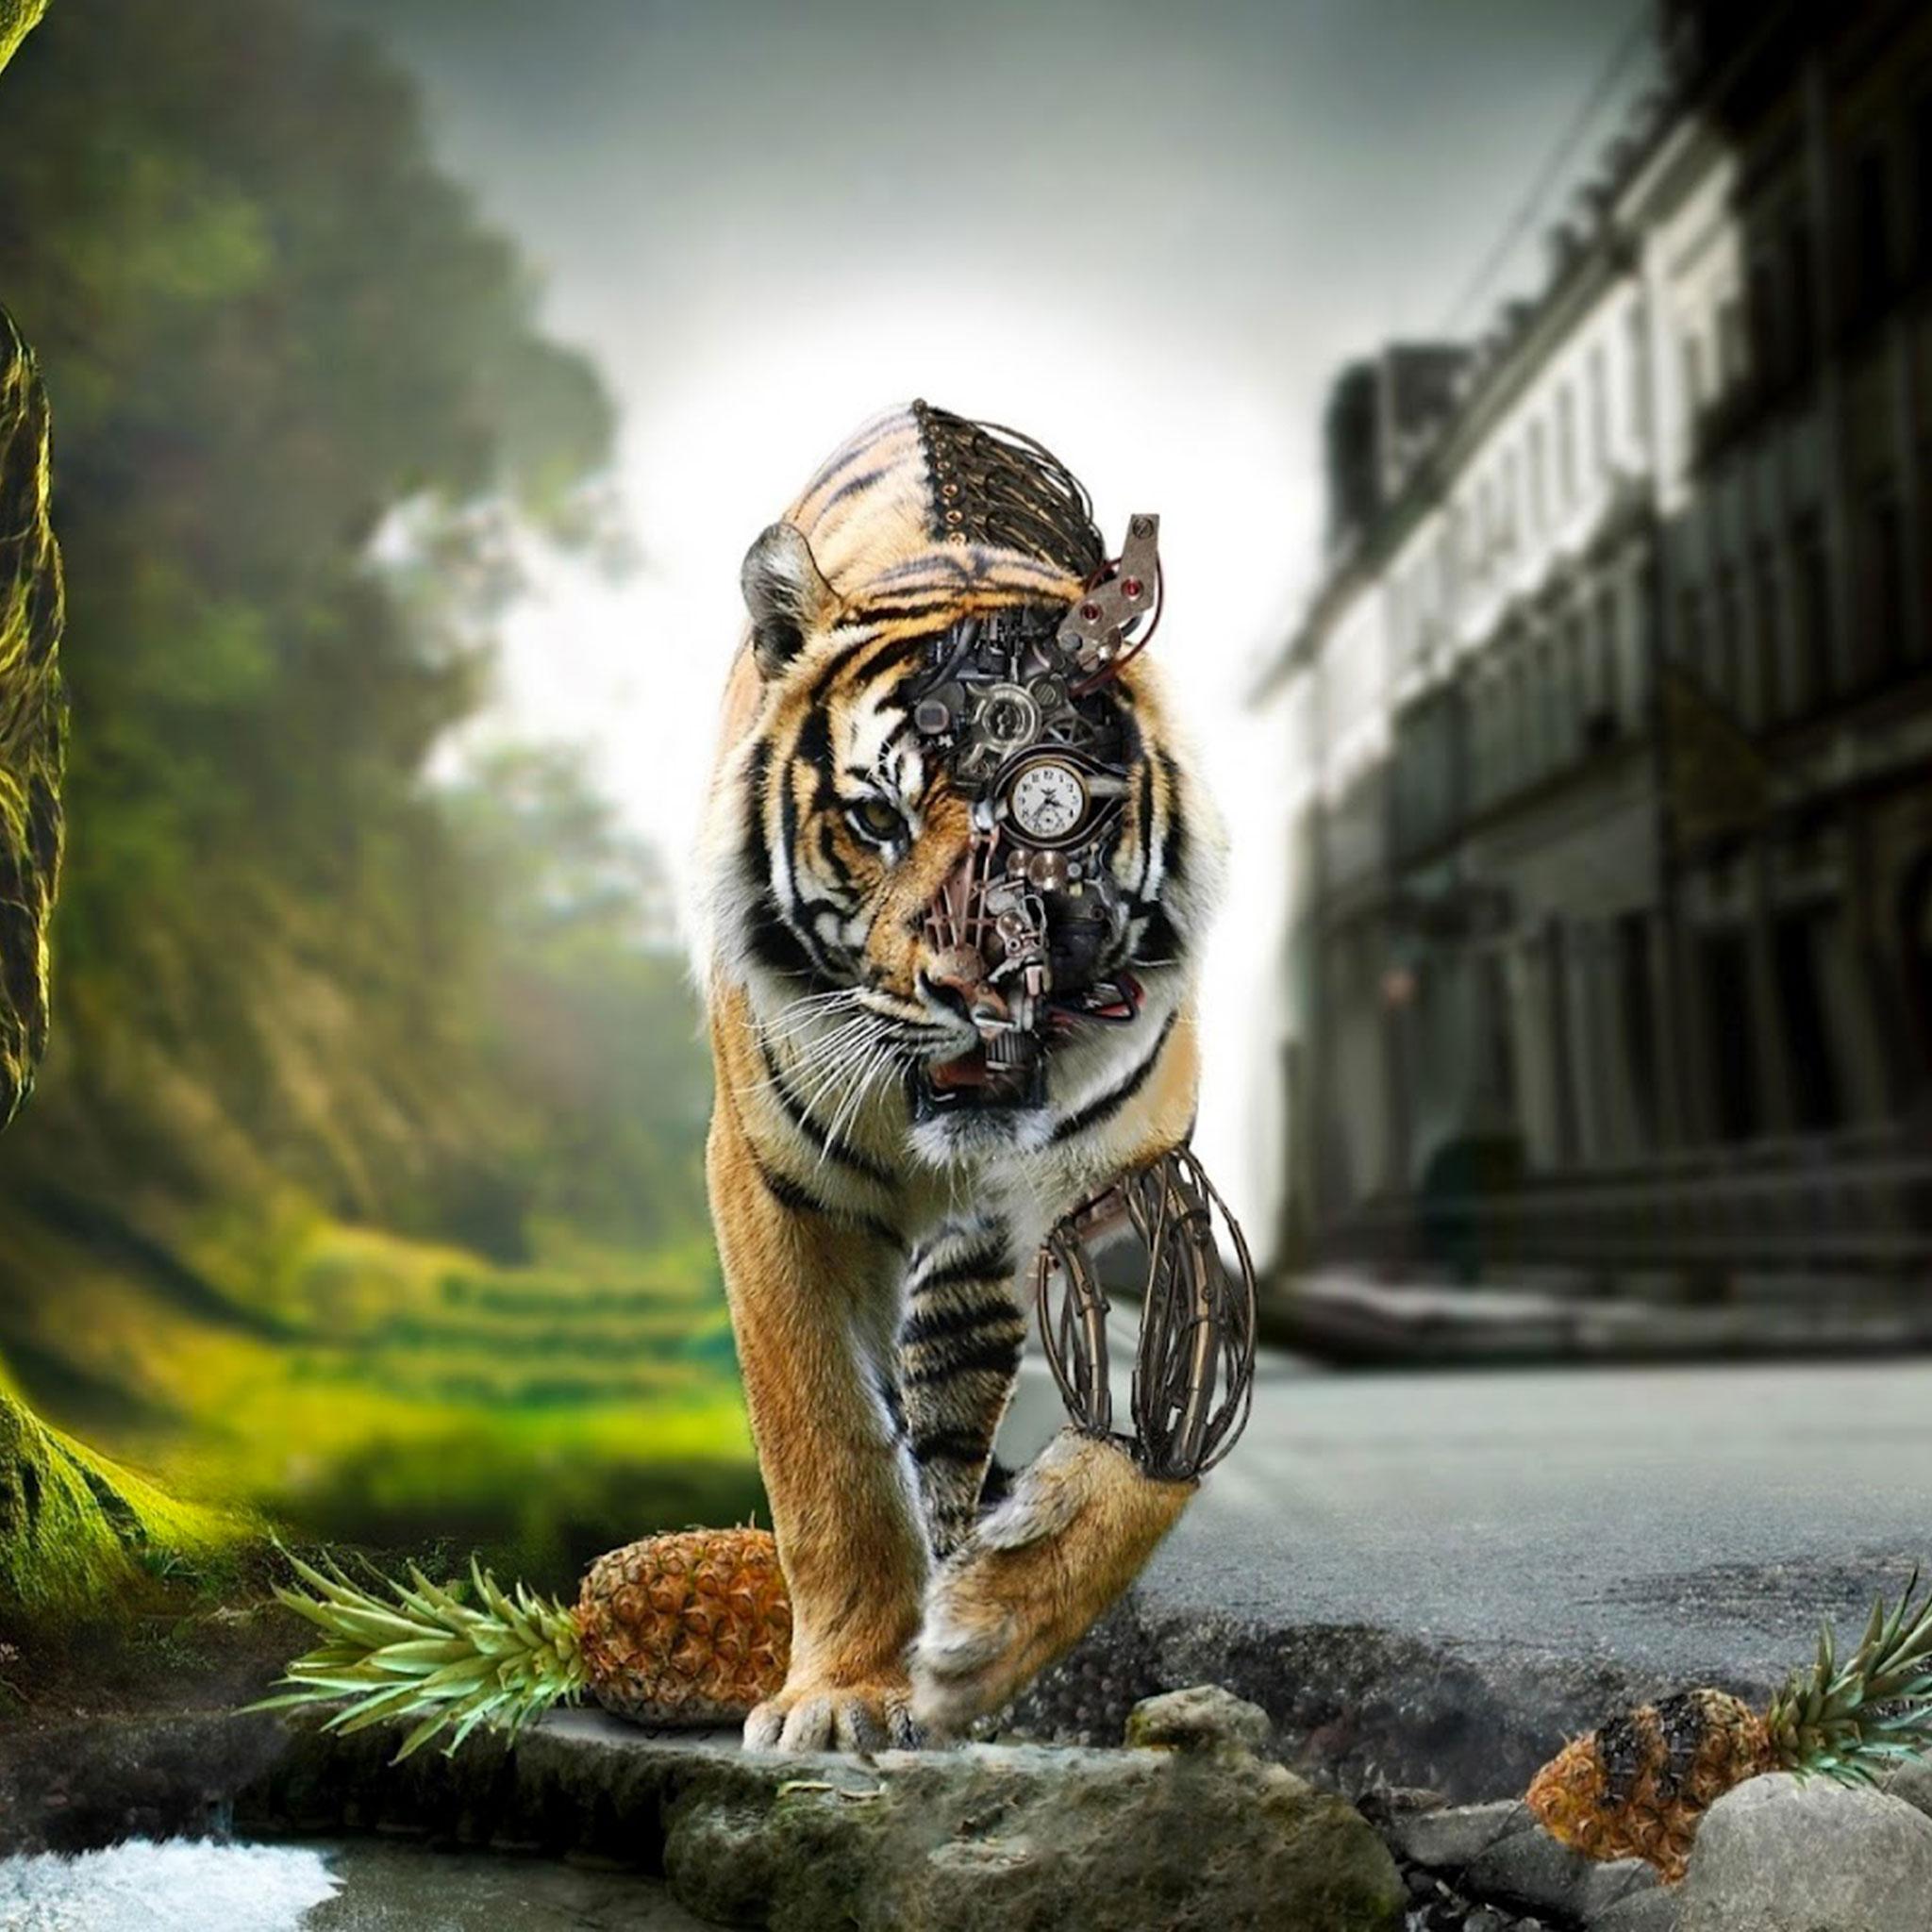 Futur Tiger Ipad Retina Wallpaper For Iphone X 8 7 6 Free